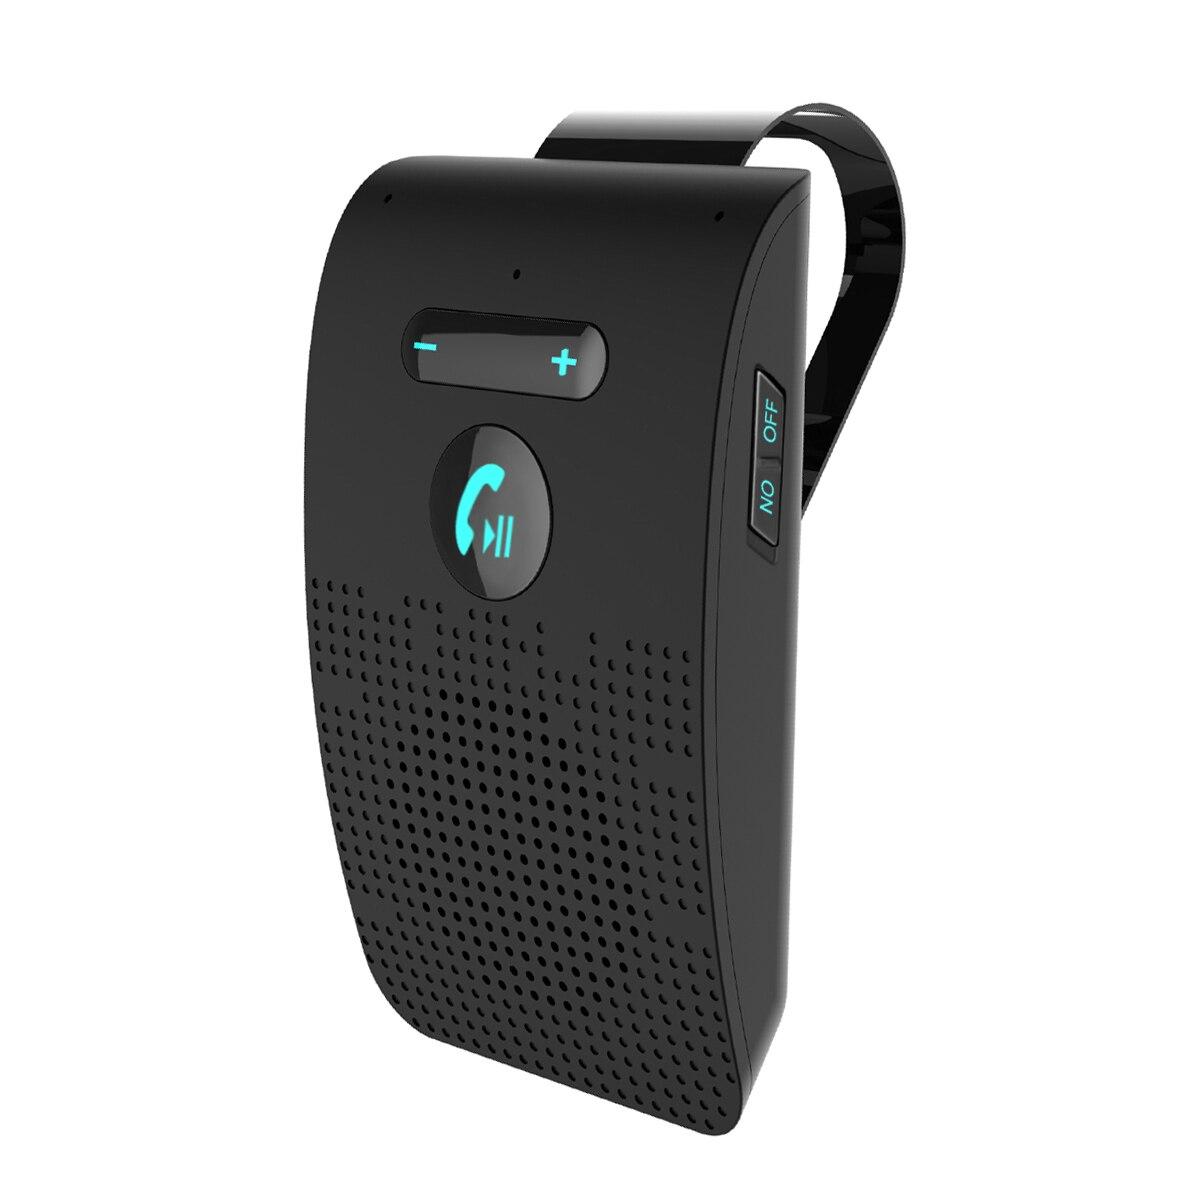 Bluetooth Mãos Livres Bluetooth Car Kit Car speakerphone multiponto viseira Speakerphone Bluetooth 4.1 edr bluetooth sem fio